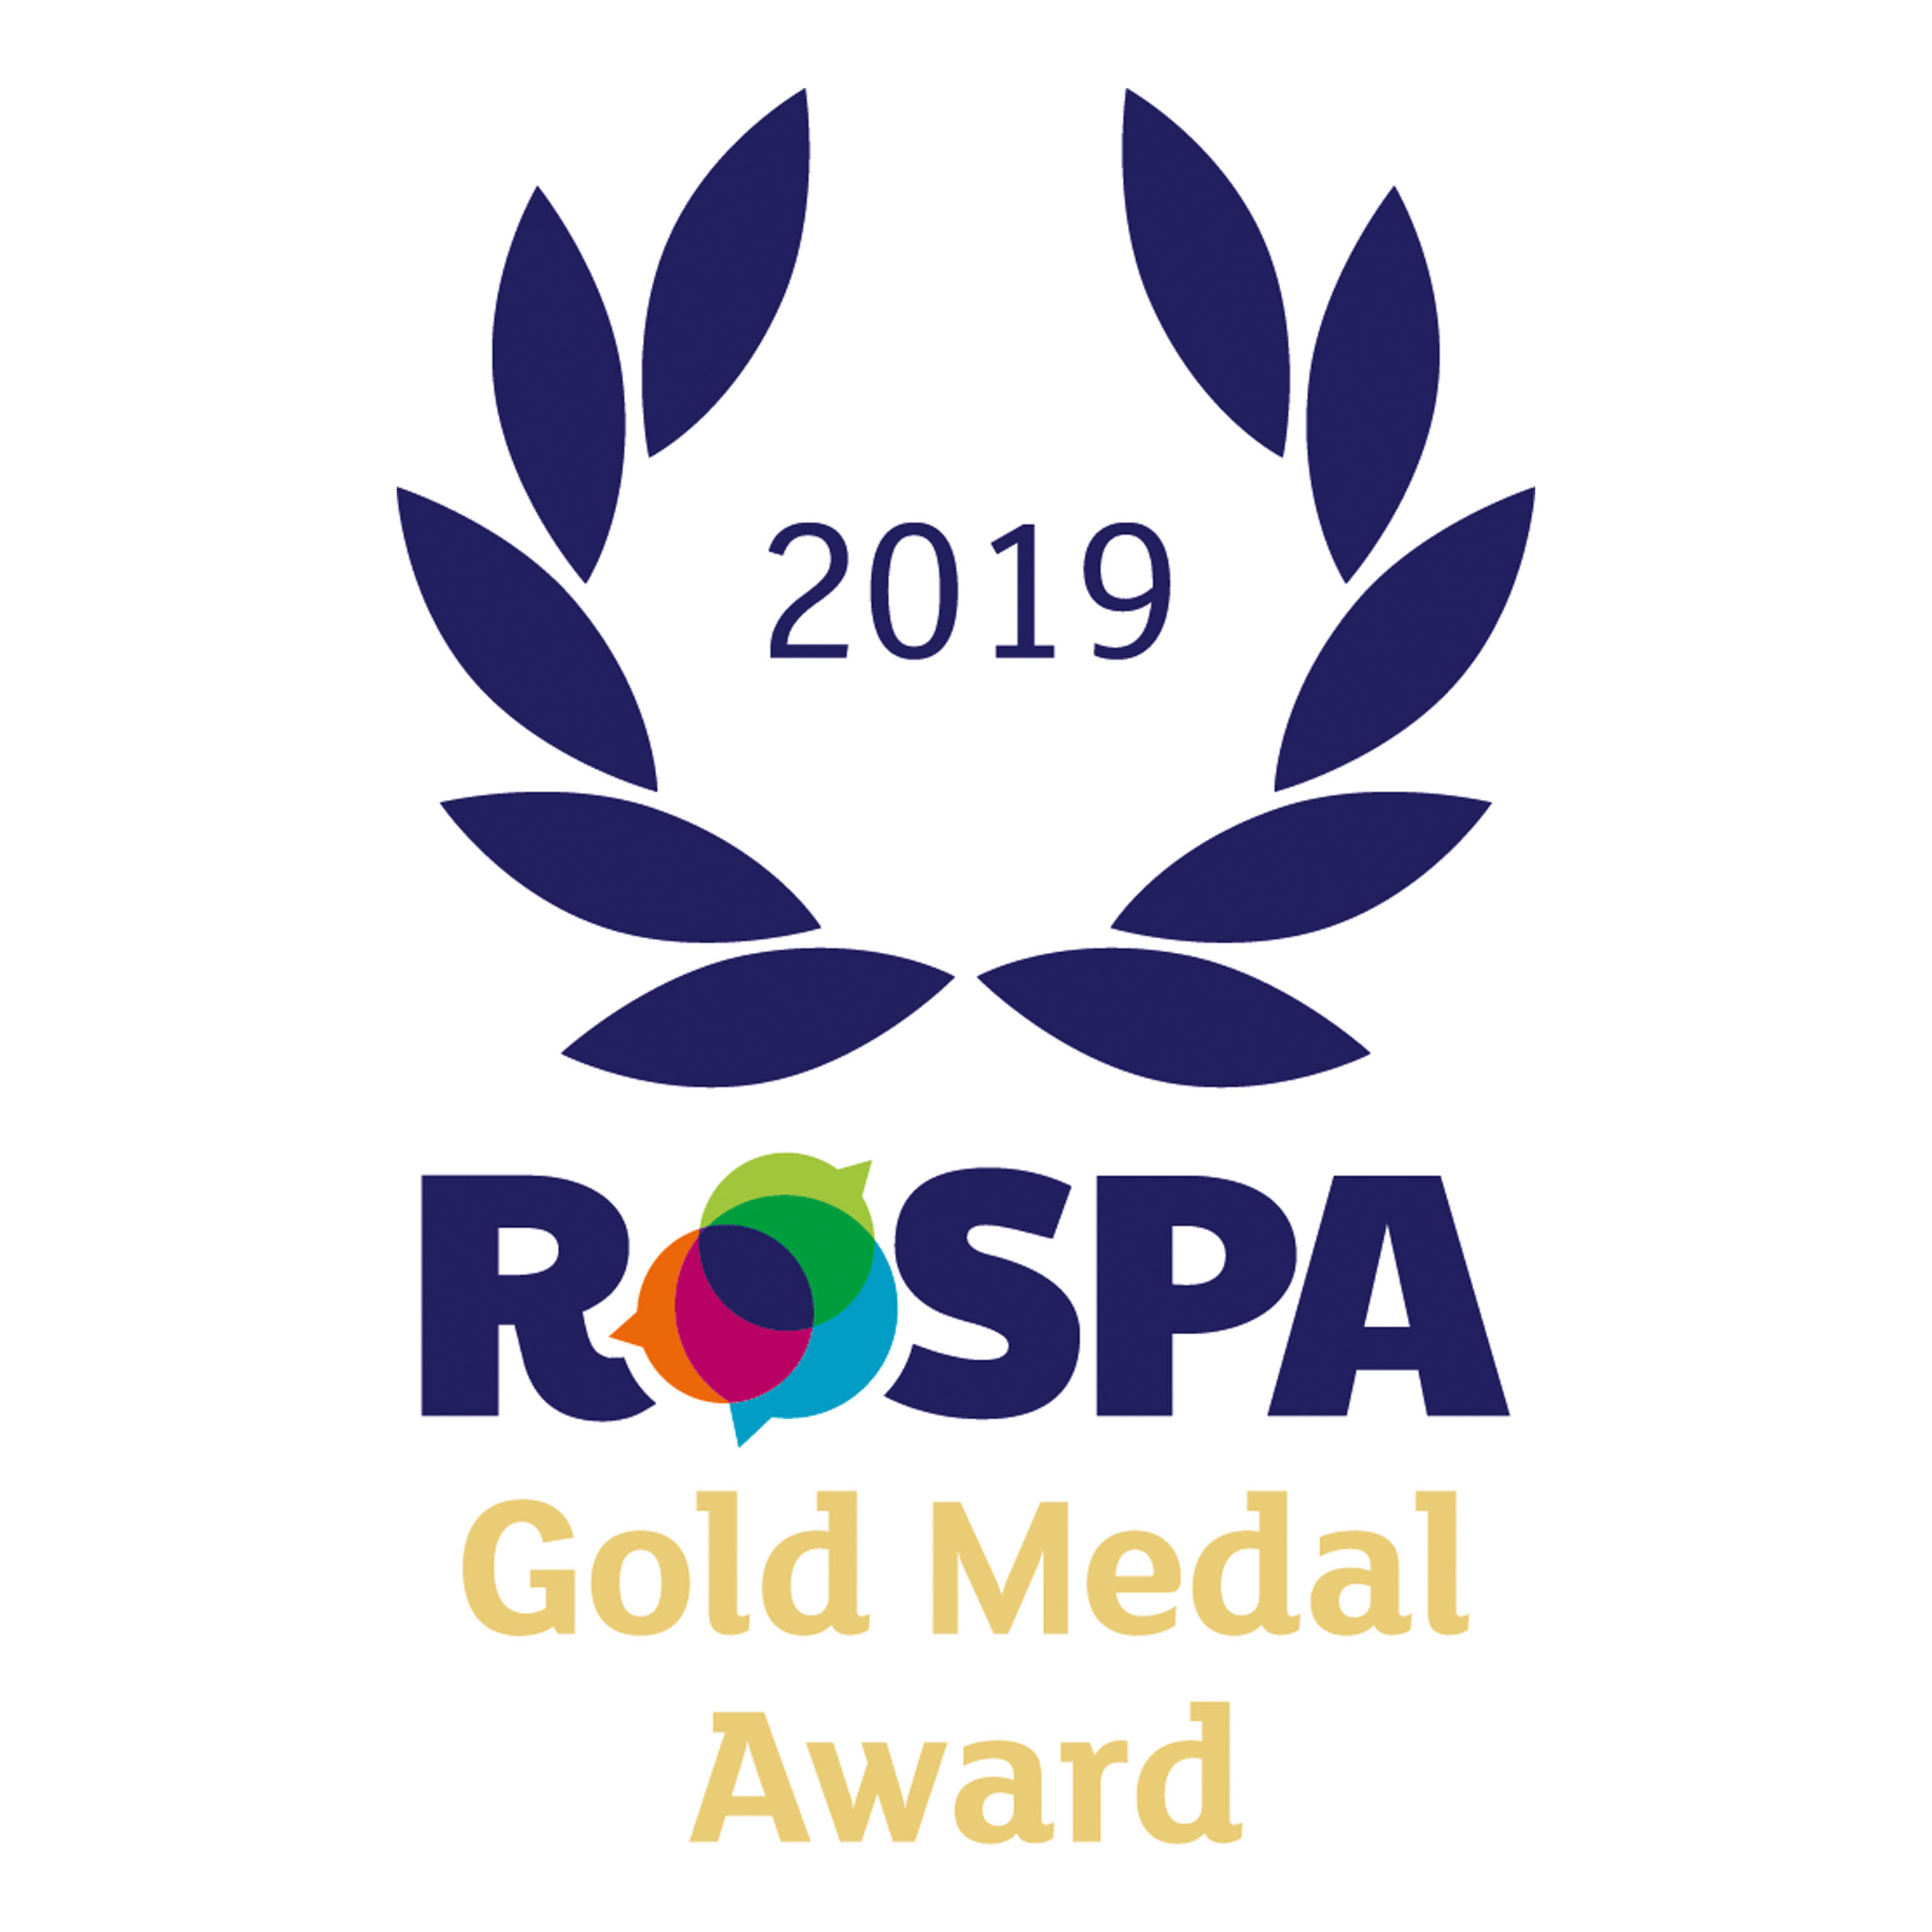 mgf-rospa-gold-medal-2019-square